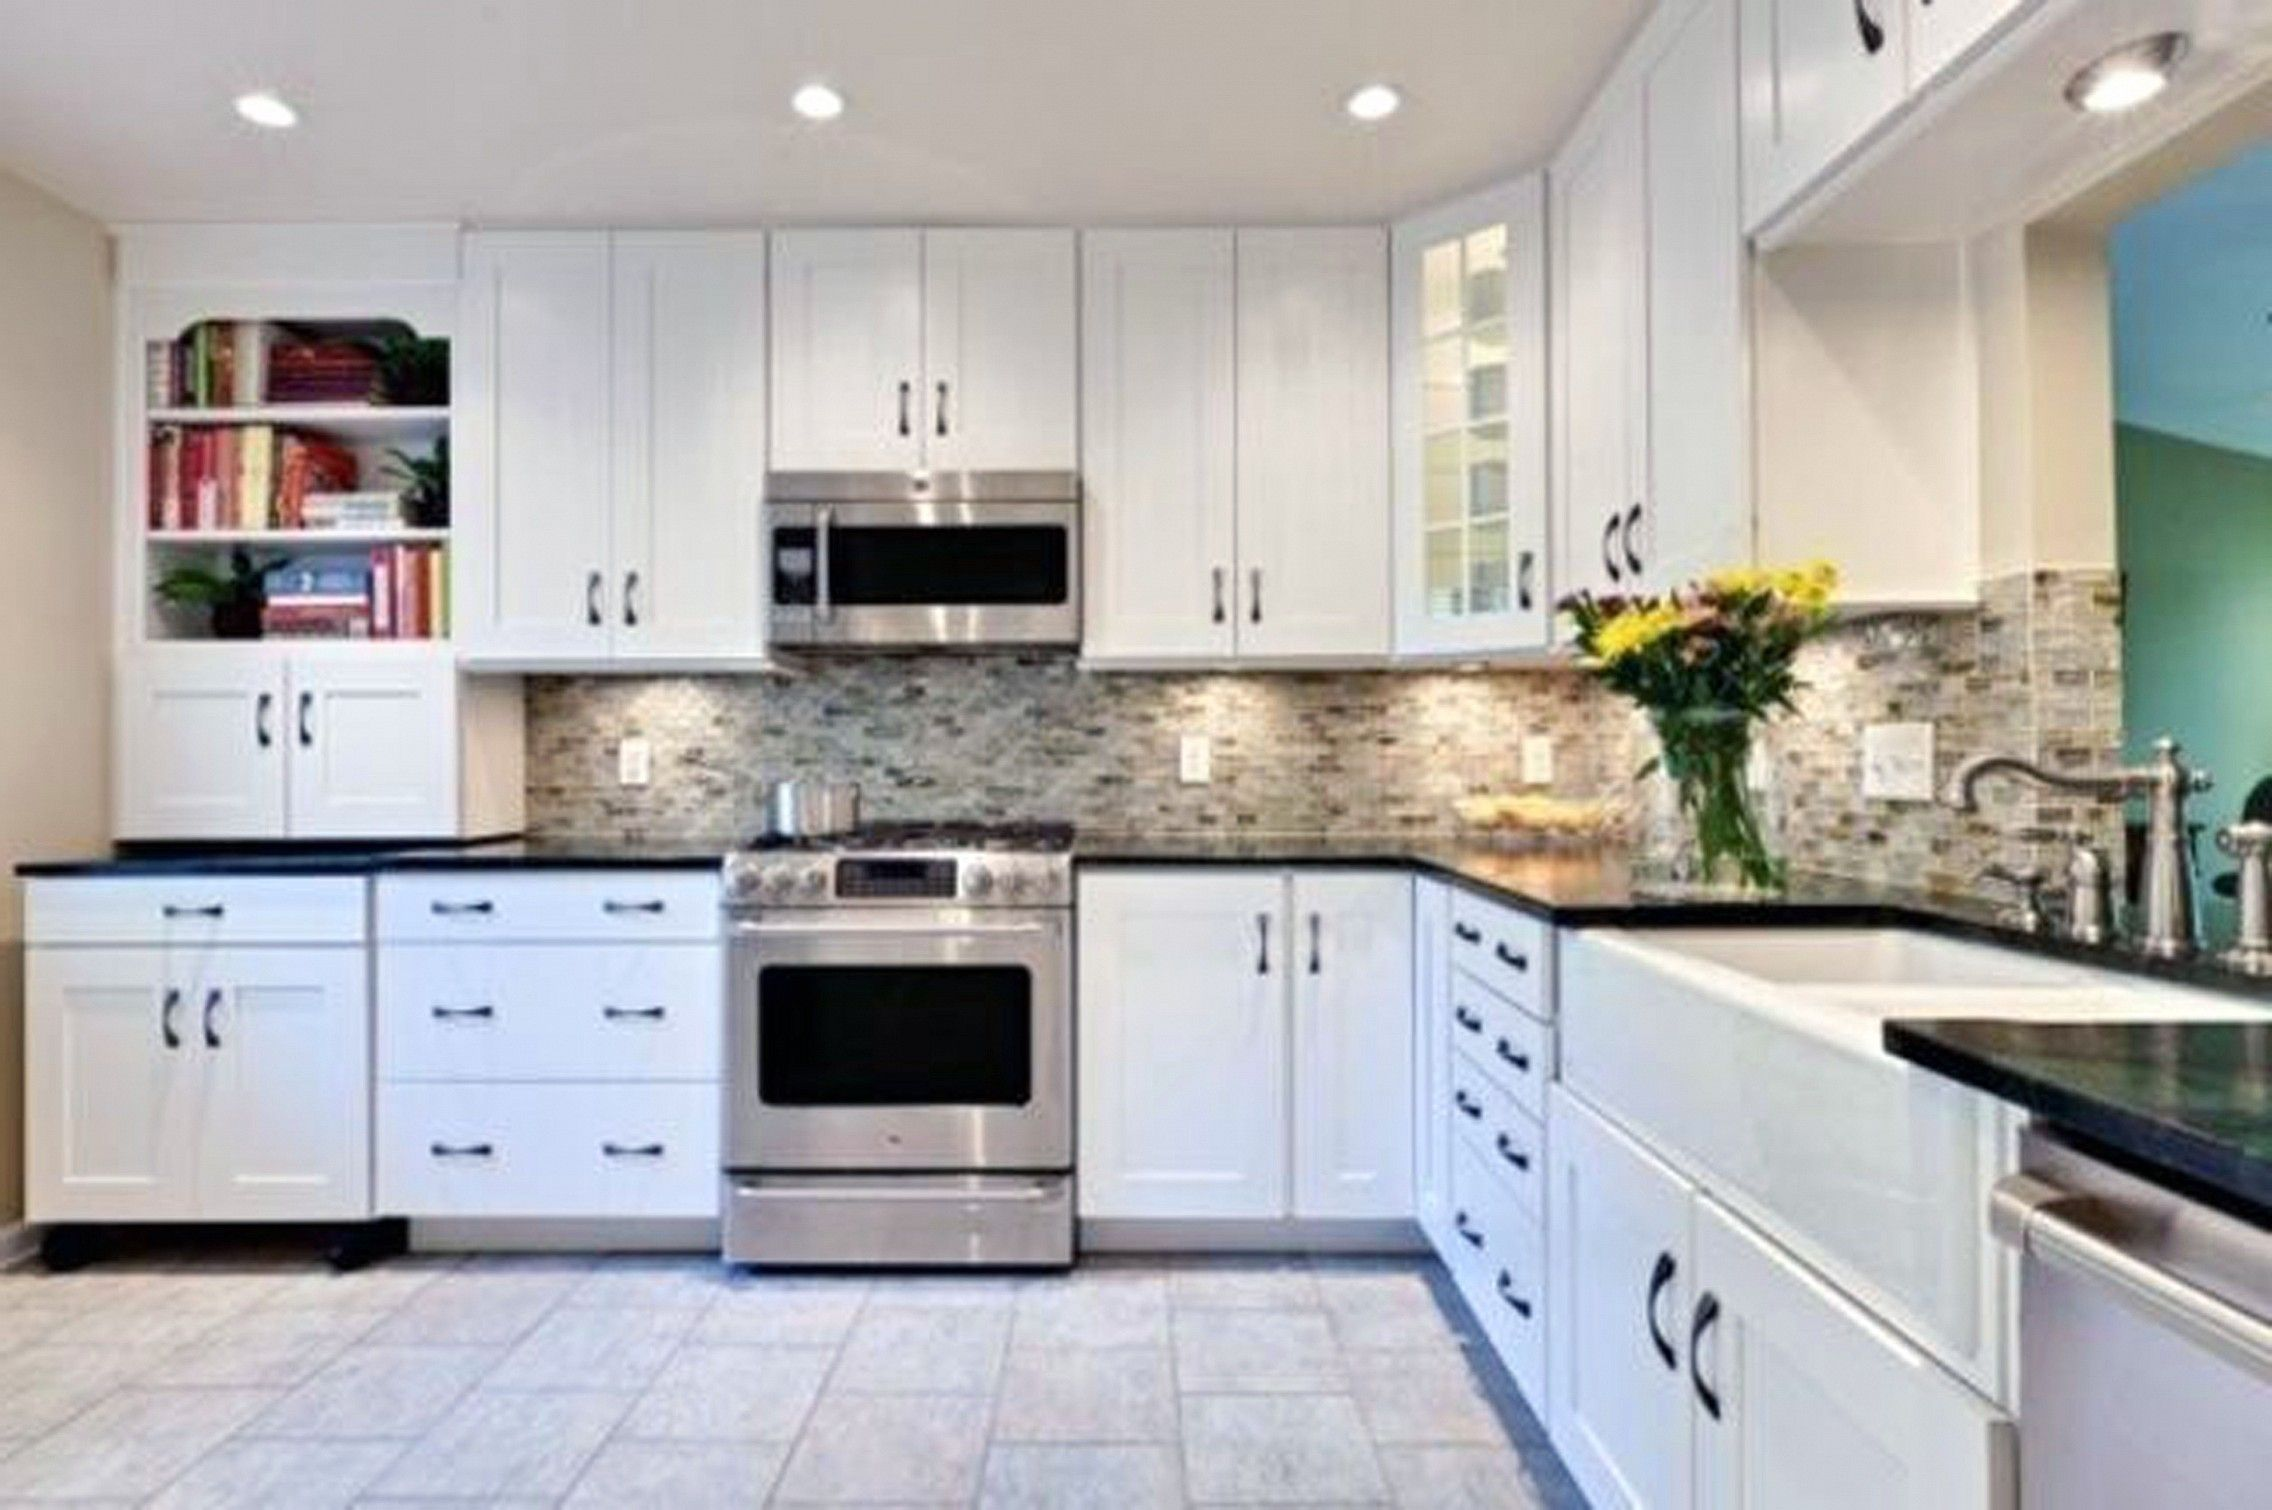 New White Cabinets with Black Granite